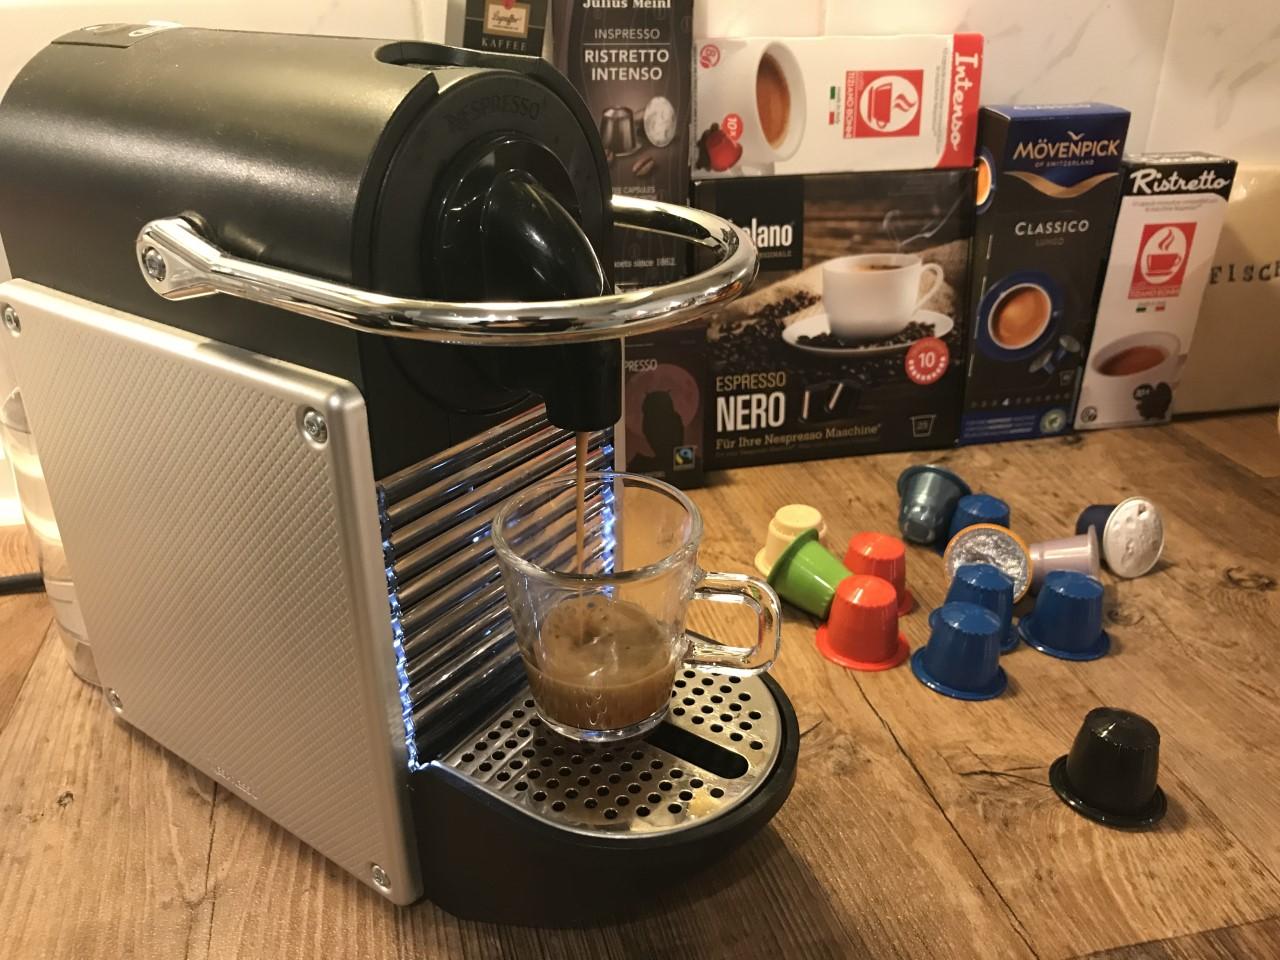 Langzeittest Kaputte Nespresso Maschinen Durch Klon Kapseln